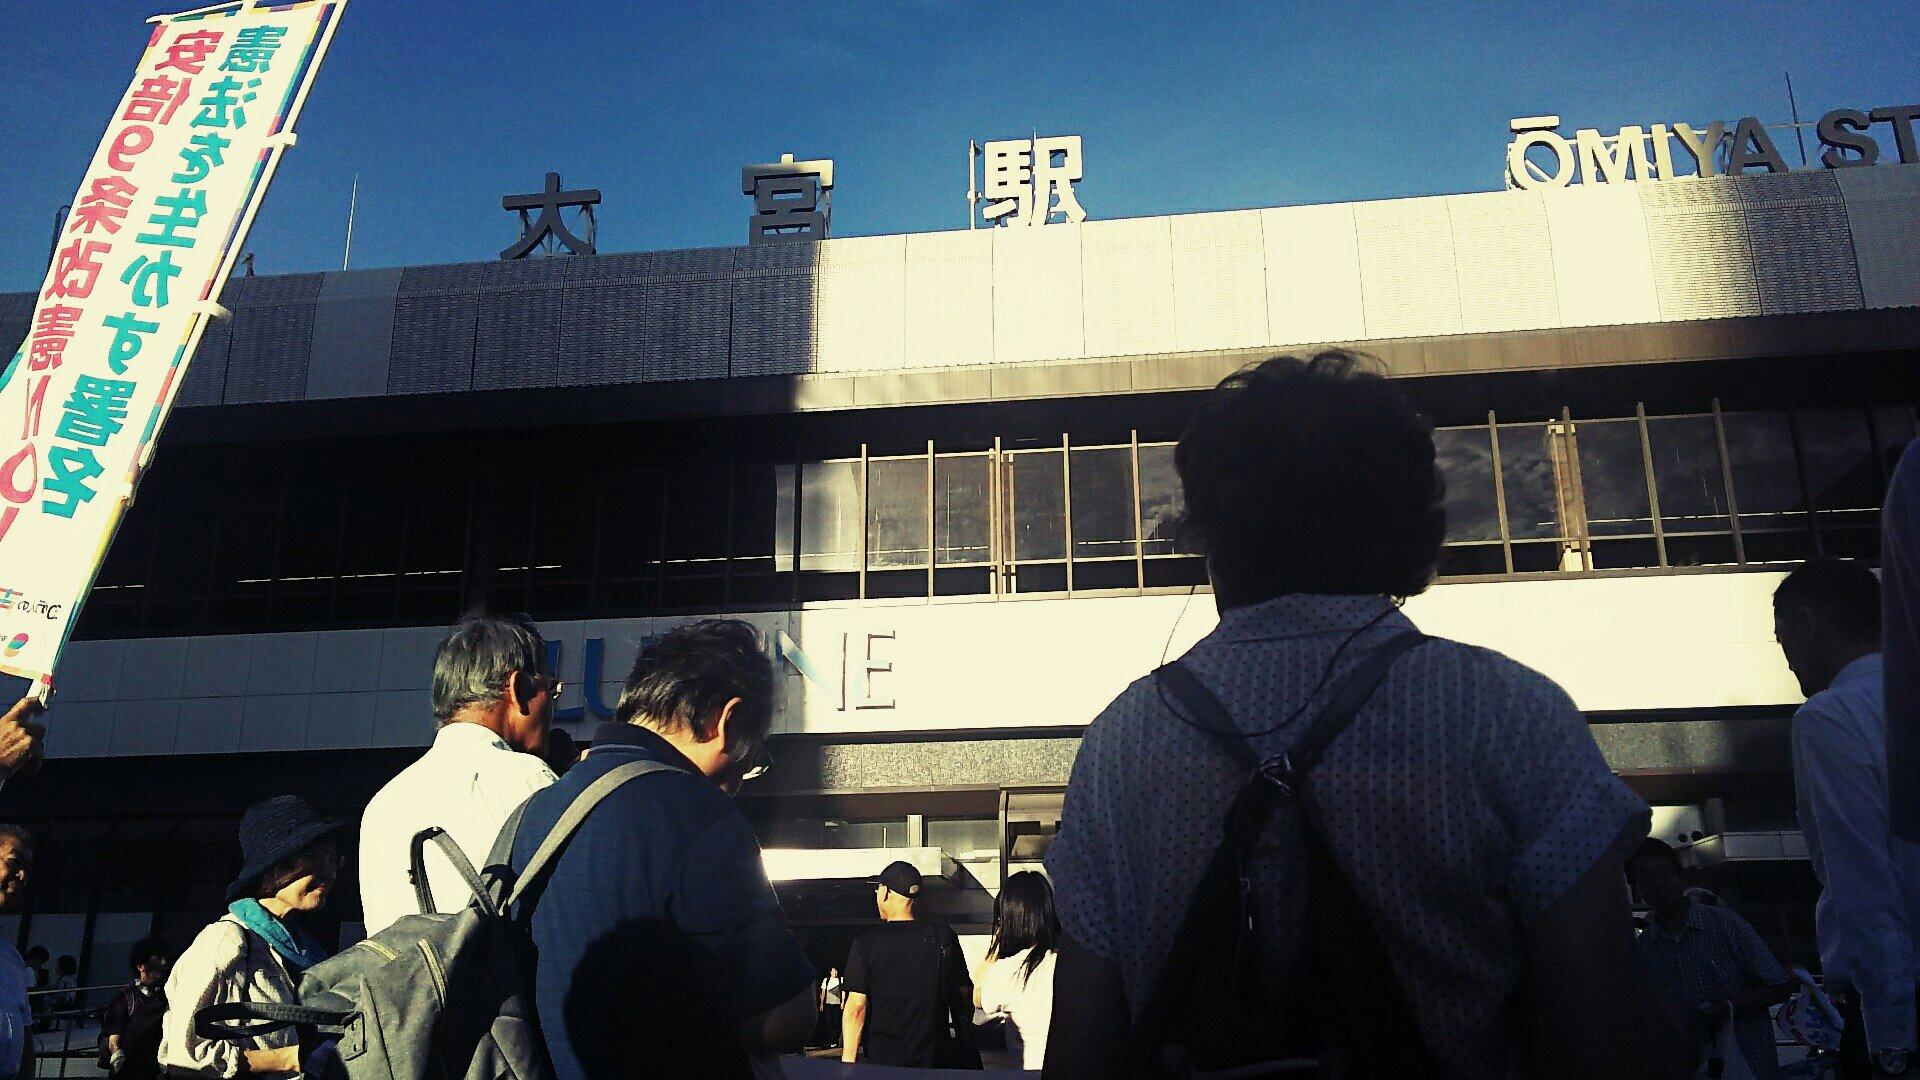 オール埼玉総行動宣伝